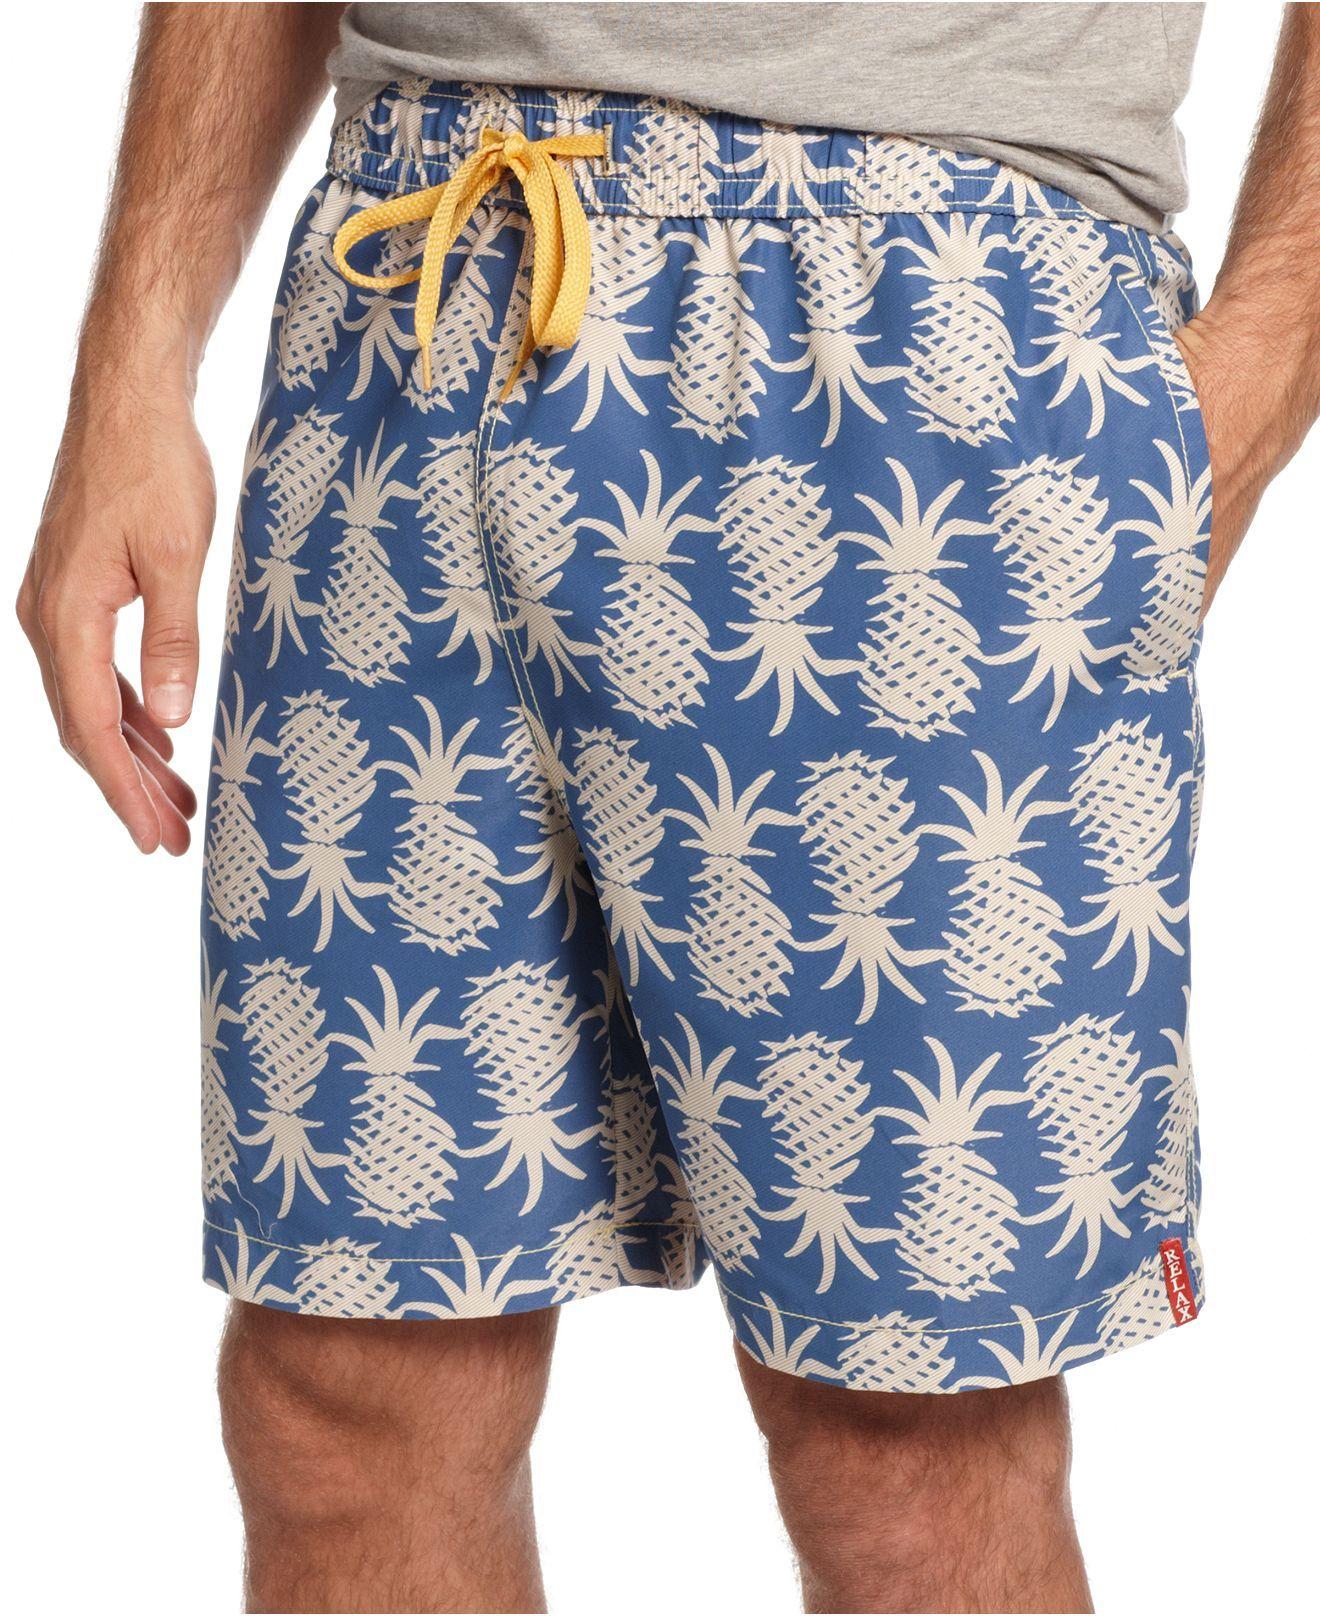 98c2b45dba Tommy Bahama Swimwear, Pineapple Upside Down Trunks - Mens Swim - Macy's